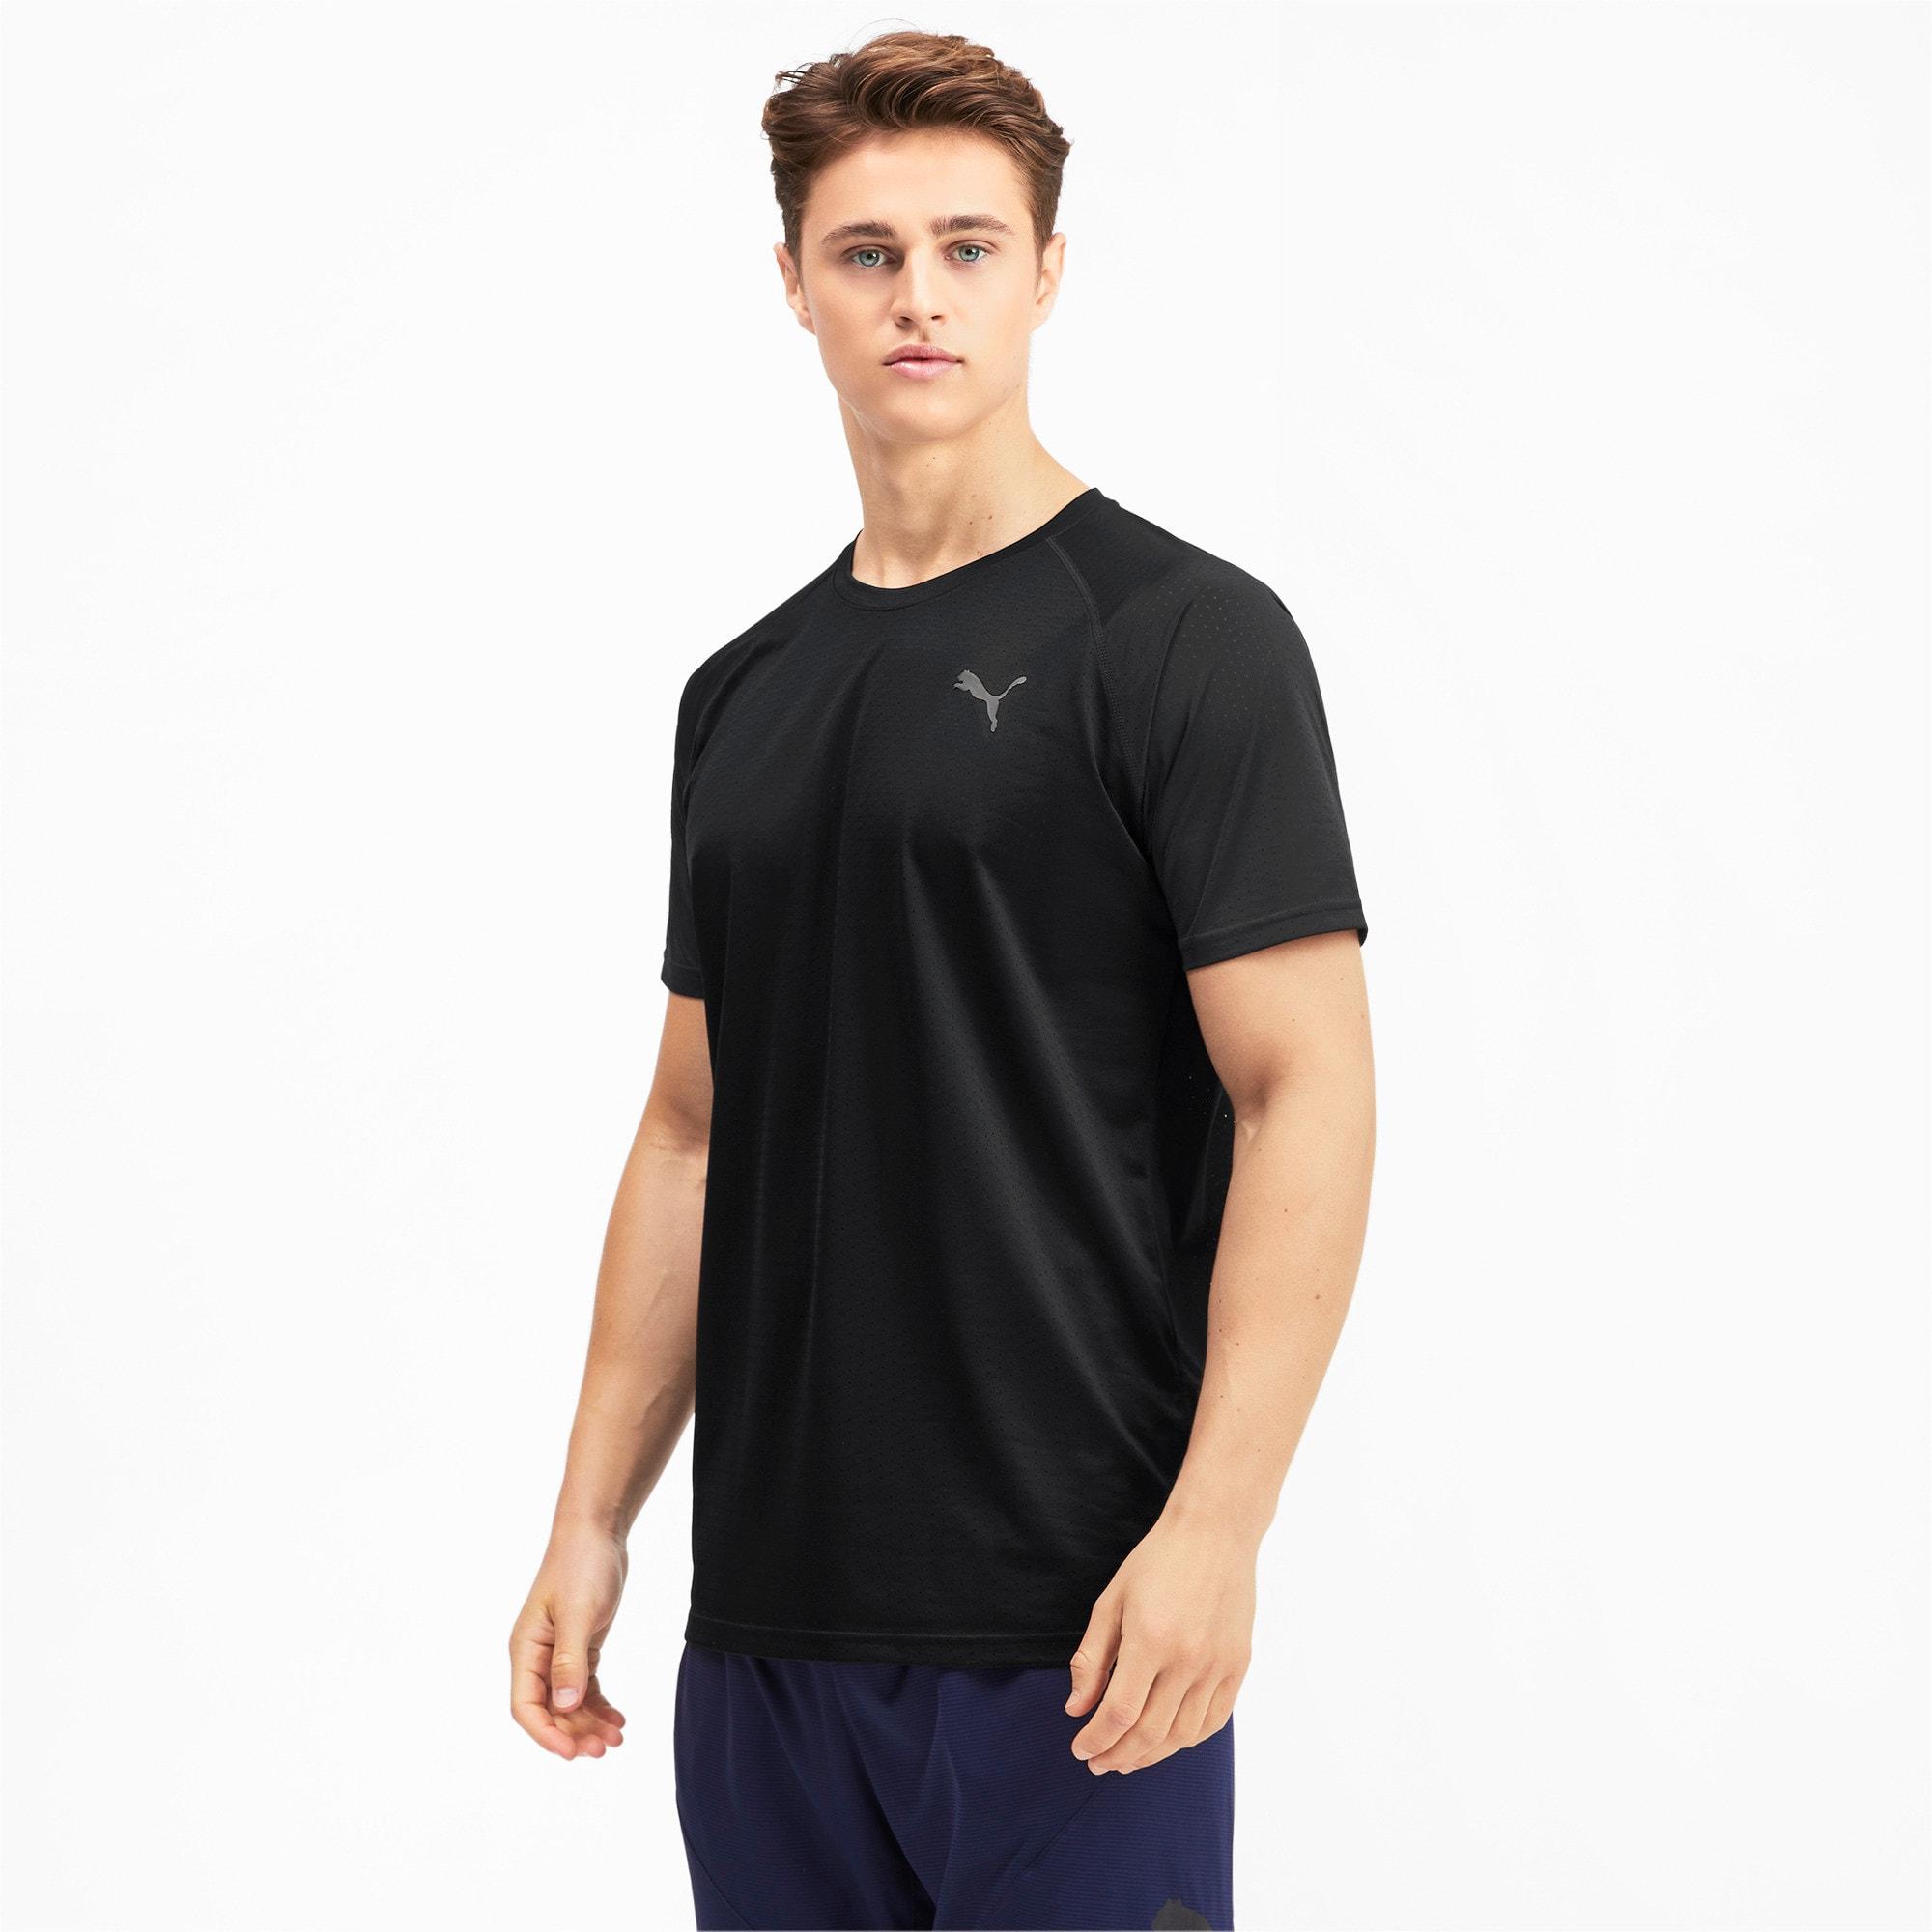 Thumbnail 1 of Tech Herren Training T-Shirt, Puma Black, medium